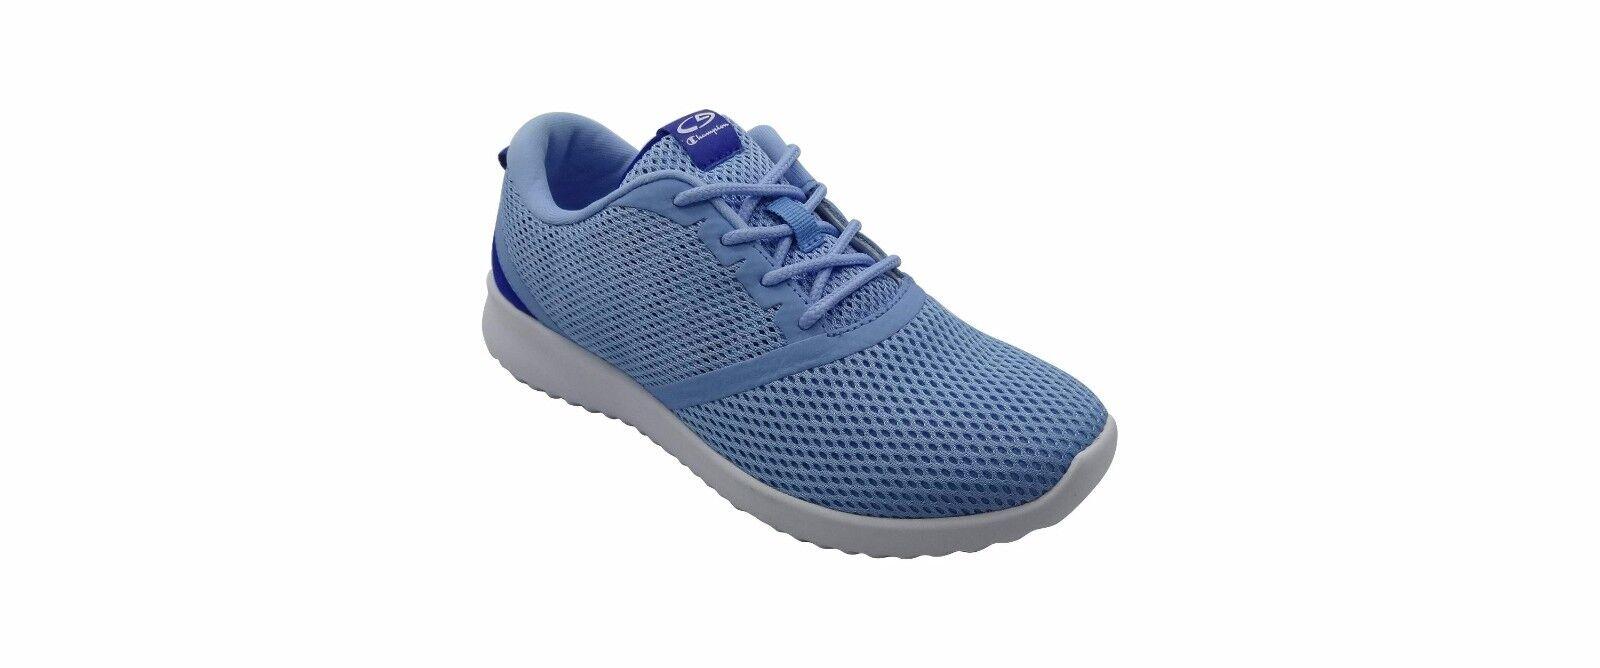 C9 Champion Women's Limit 2.0 Performance Athletic shoes bluee - Size  6.5